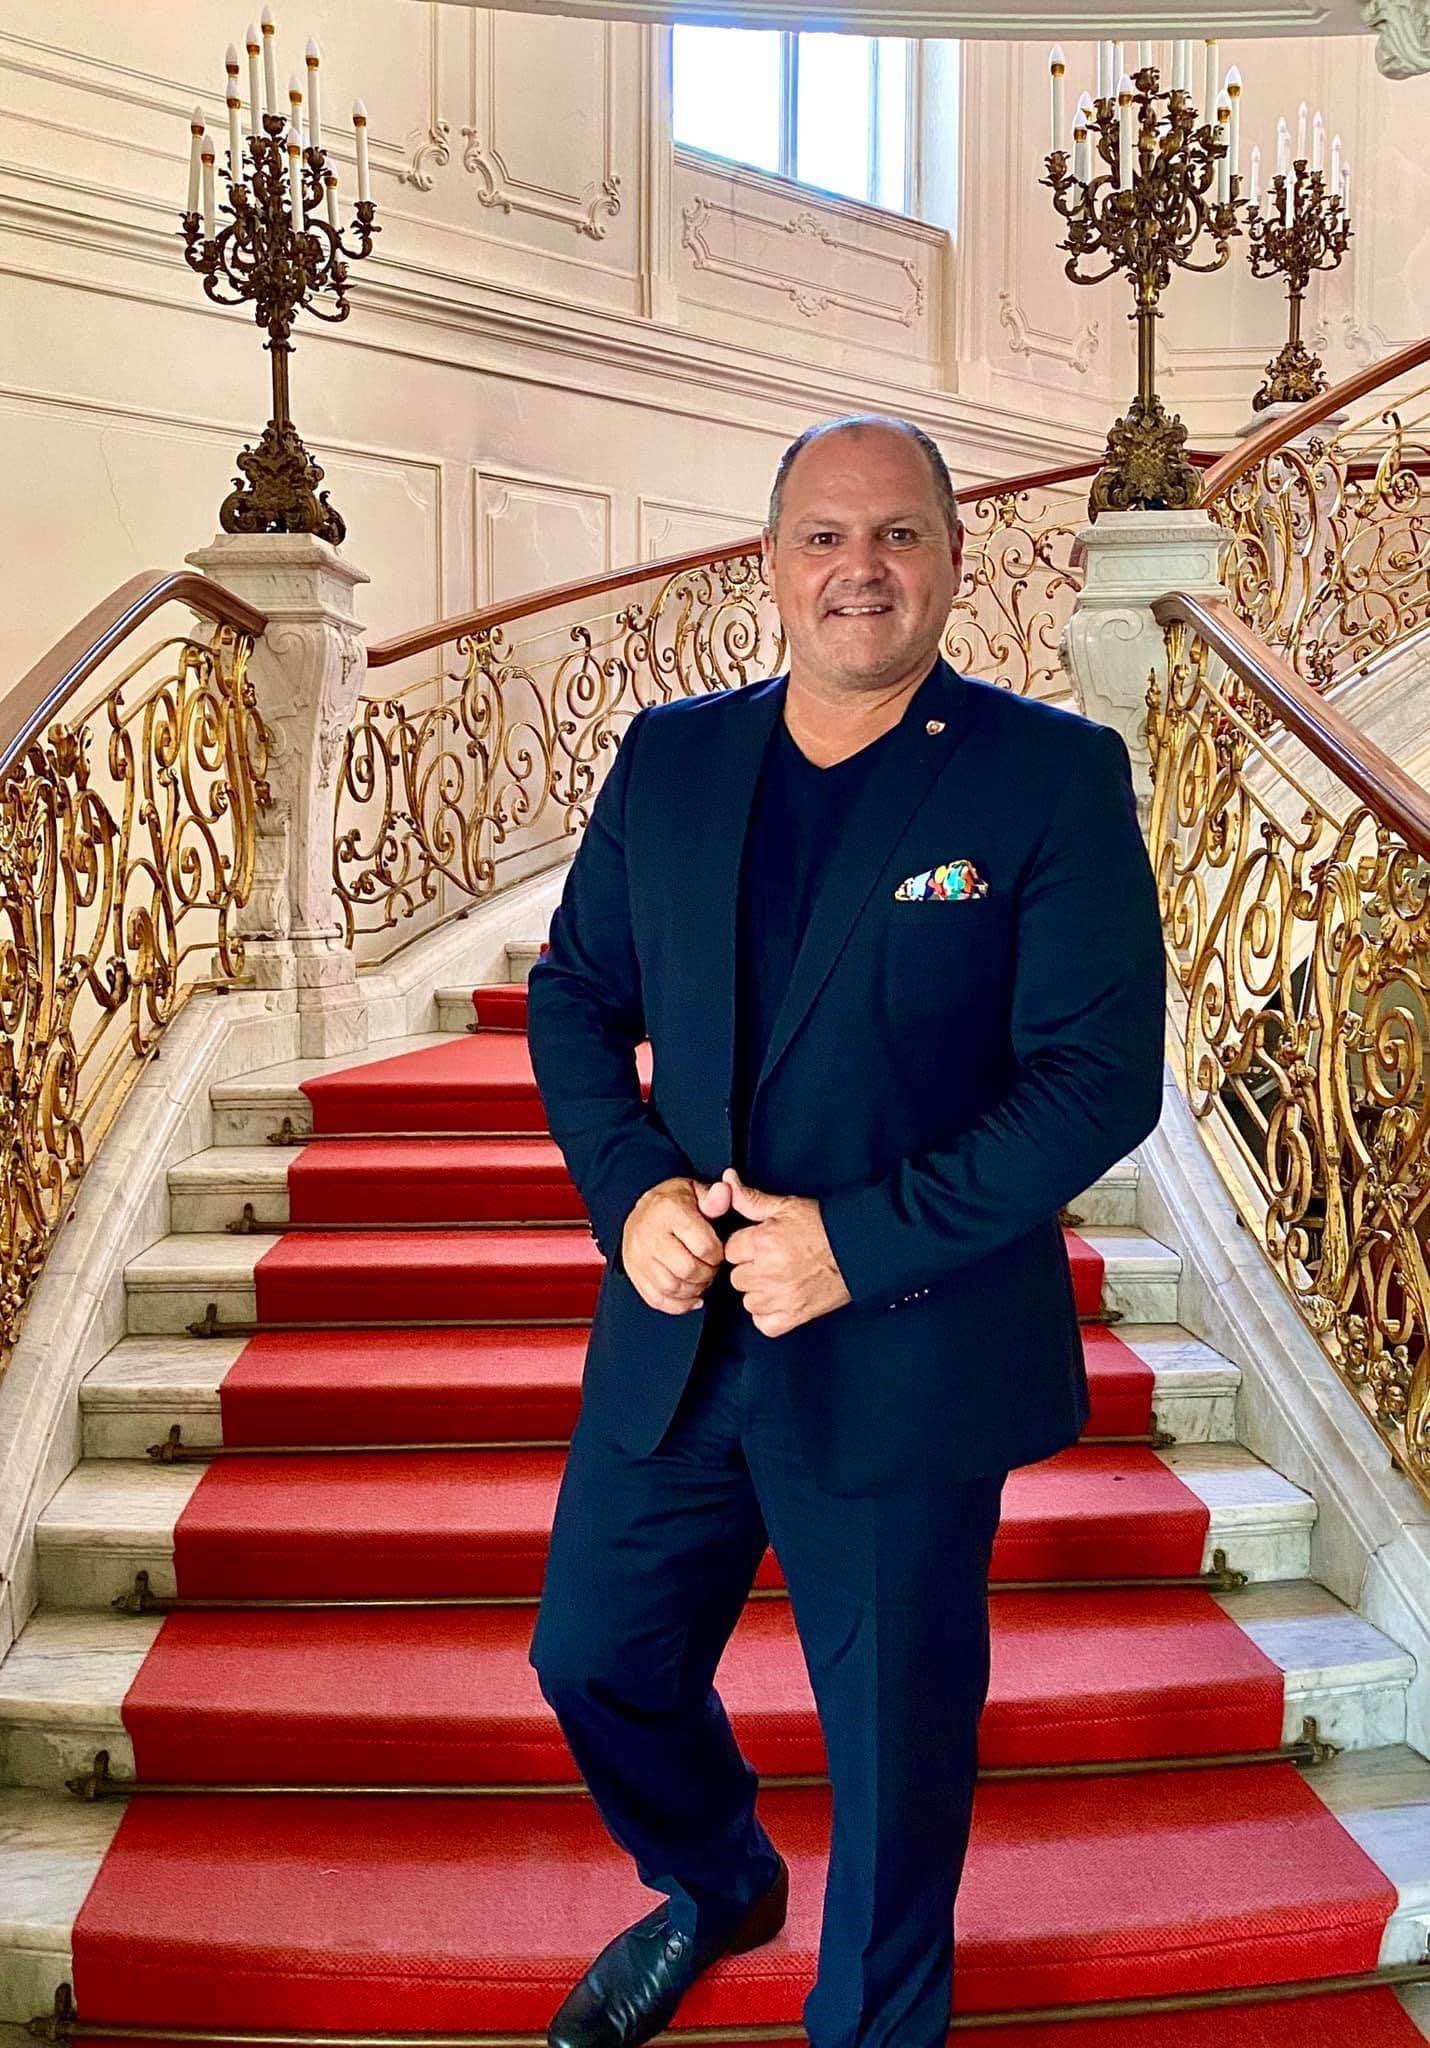 Schroll fordert rasche finanzielle Hilfe für Wiener Sängerknaben